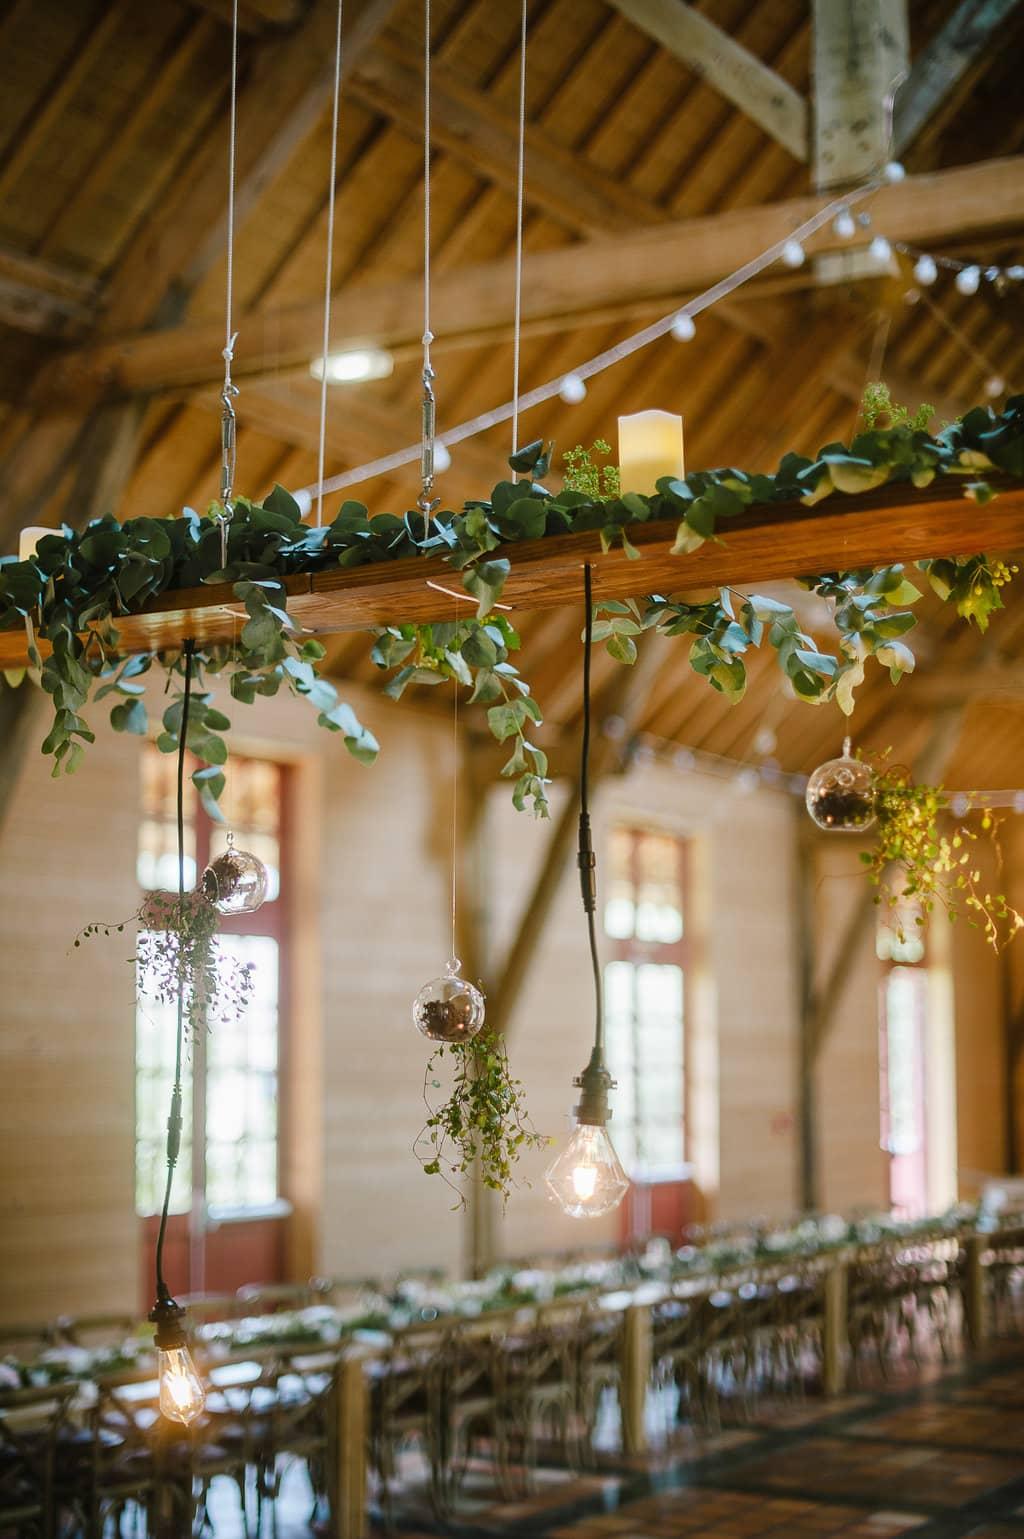 suspension-feuillage-centre-table-mariage